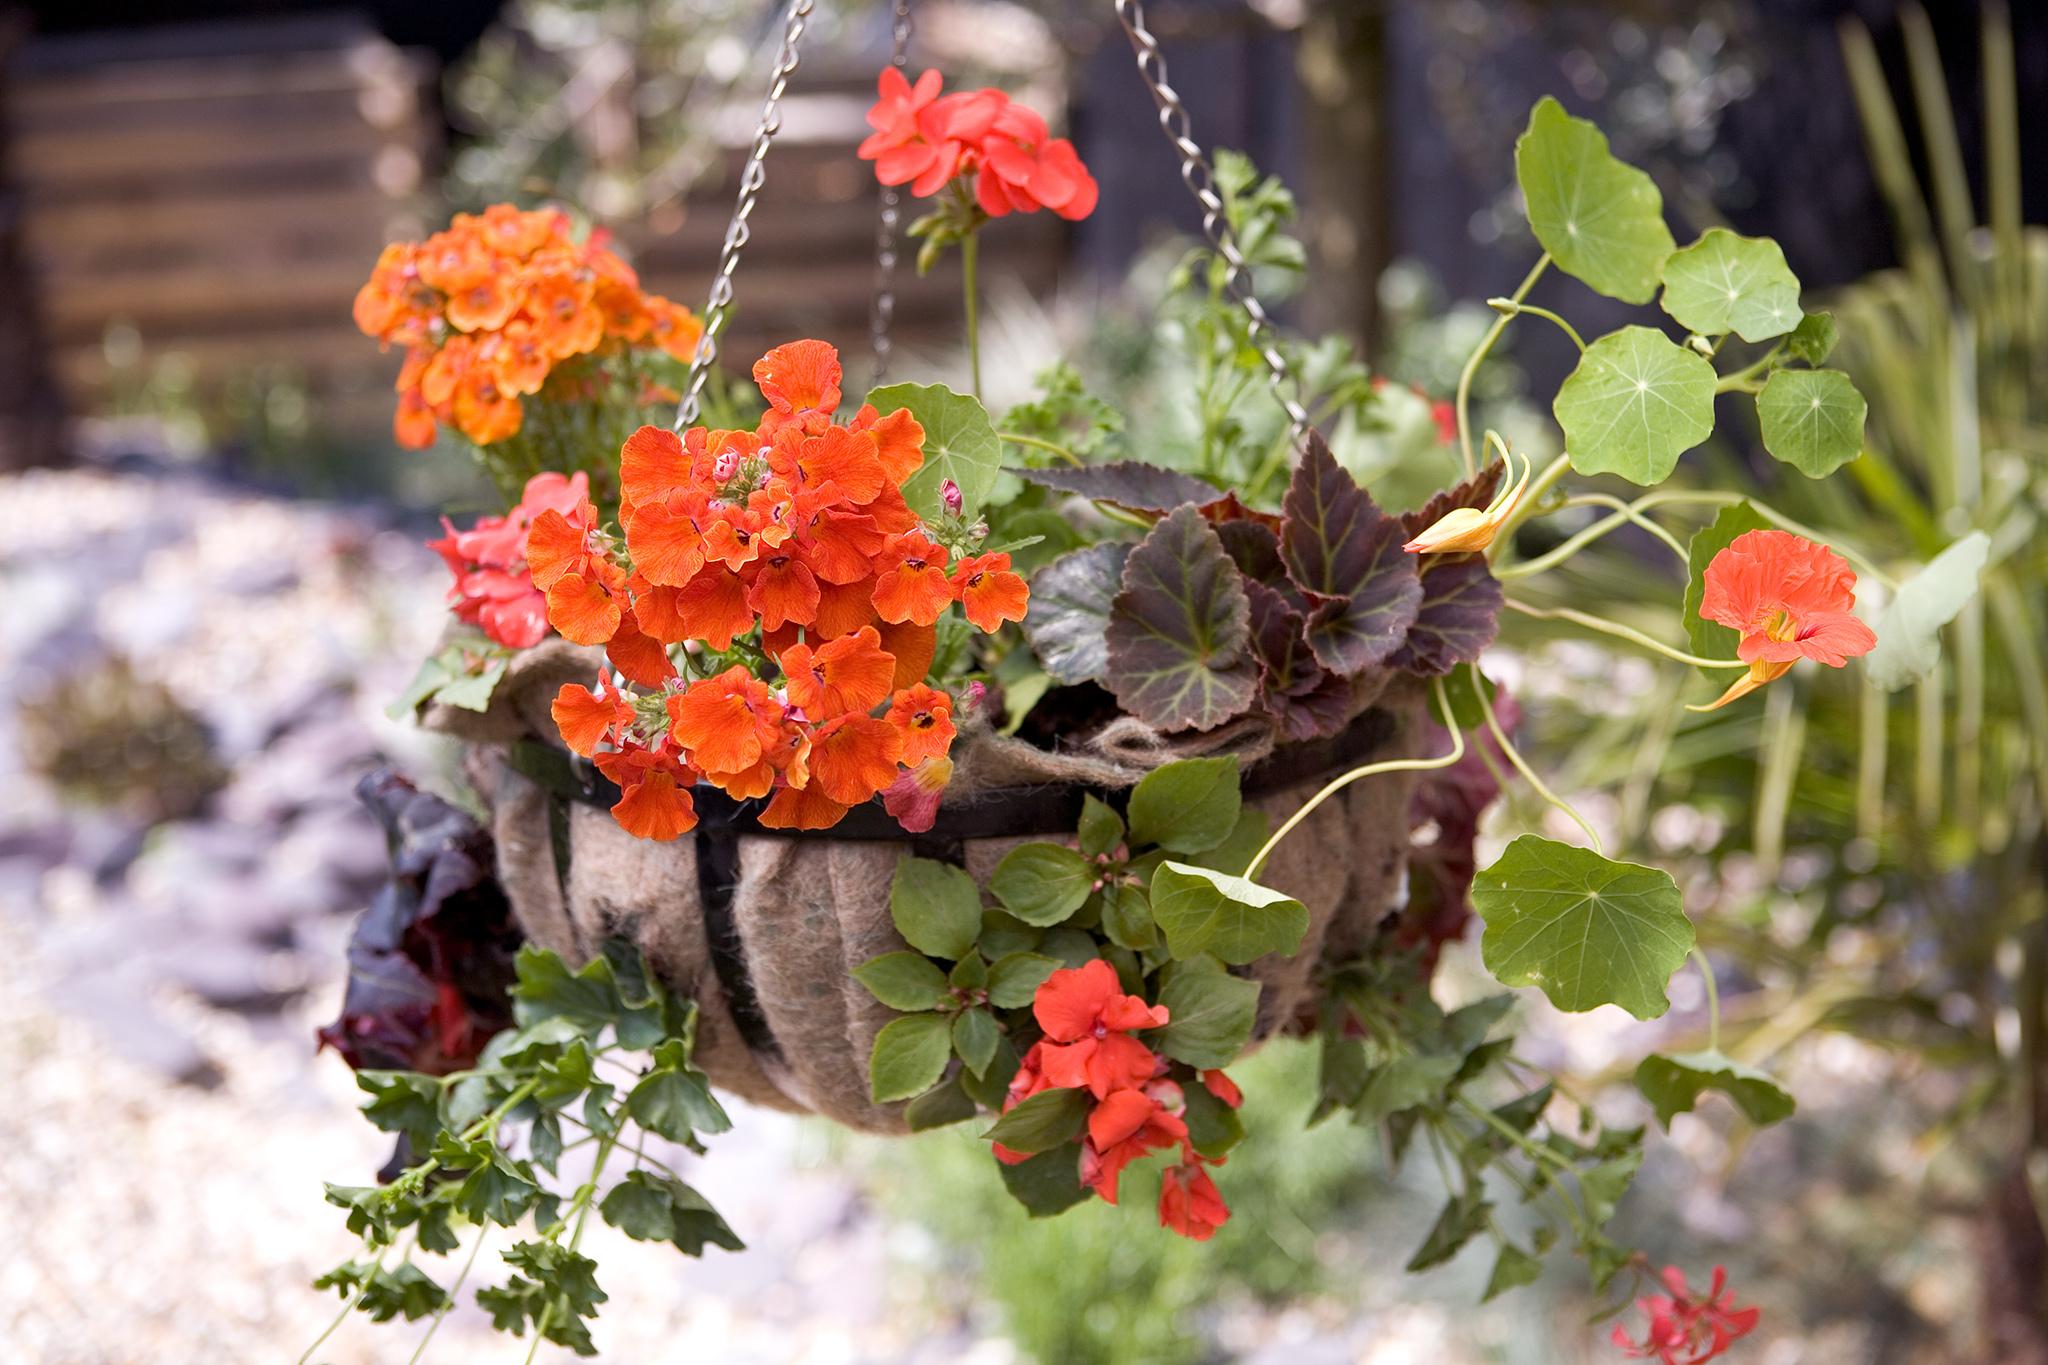 geranium-nemesia-and-nasturtium-hanging-basket-3